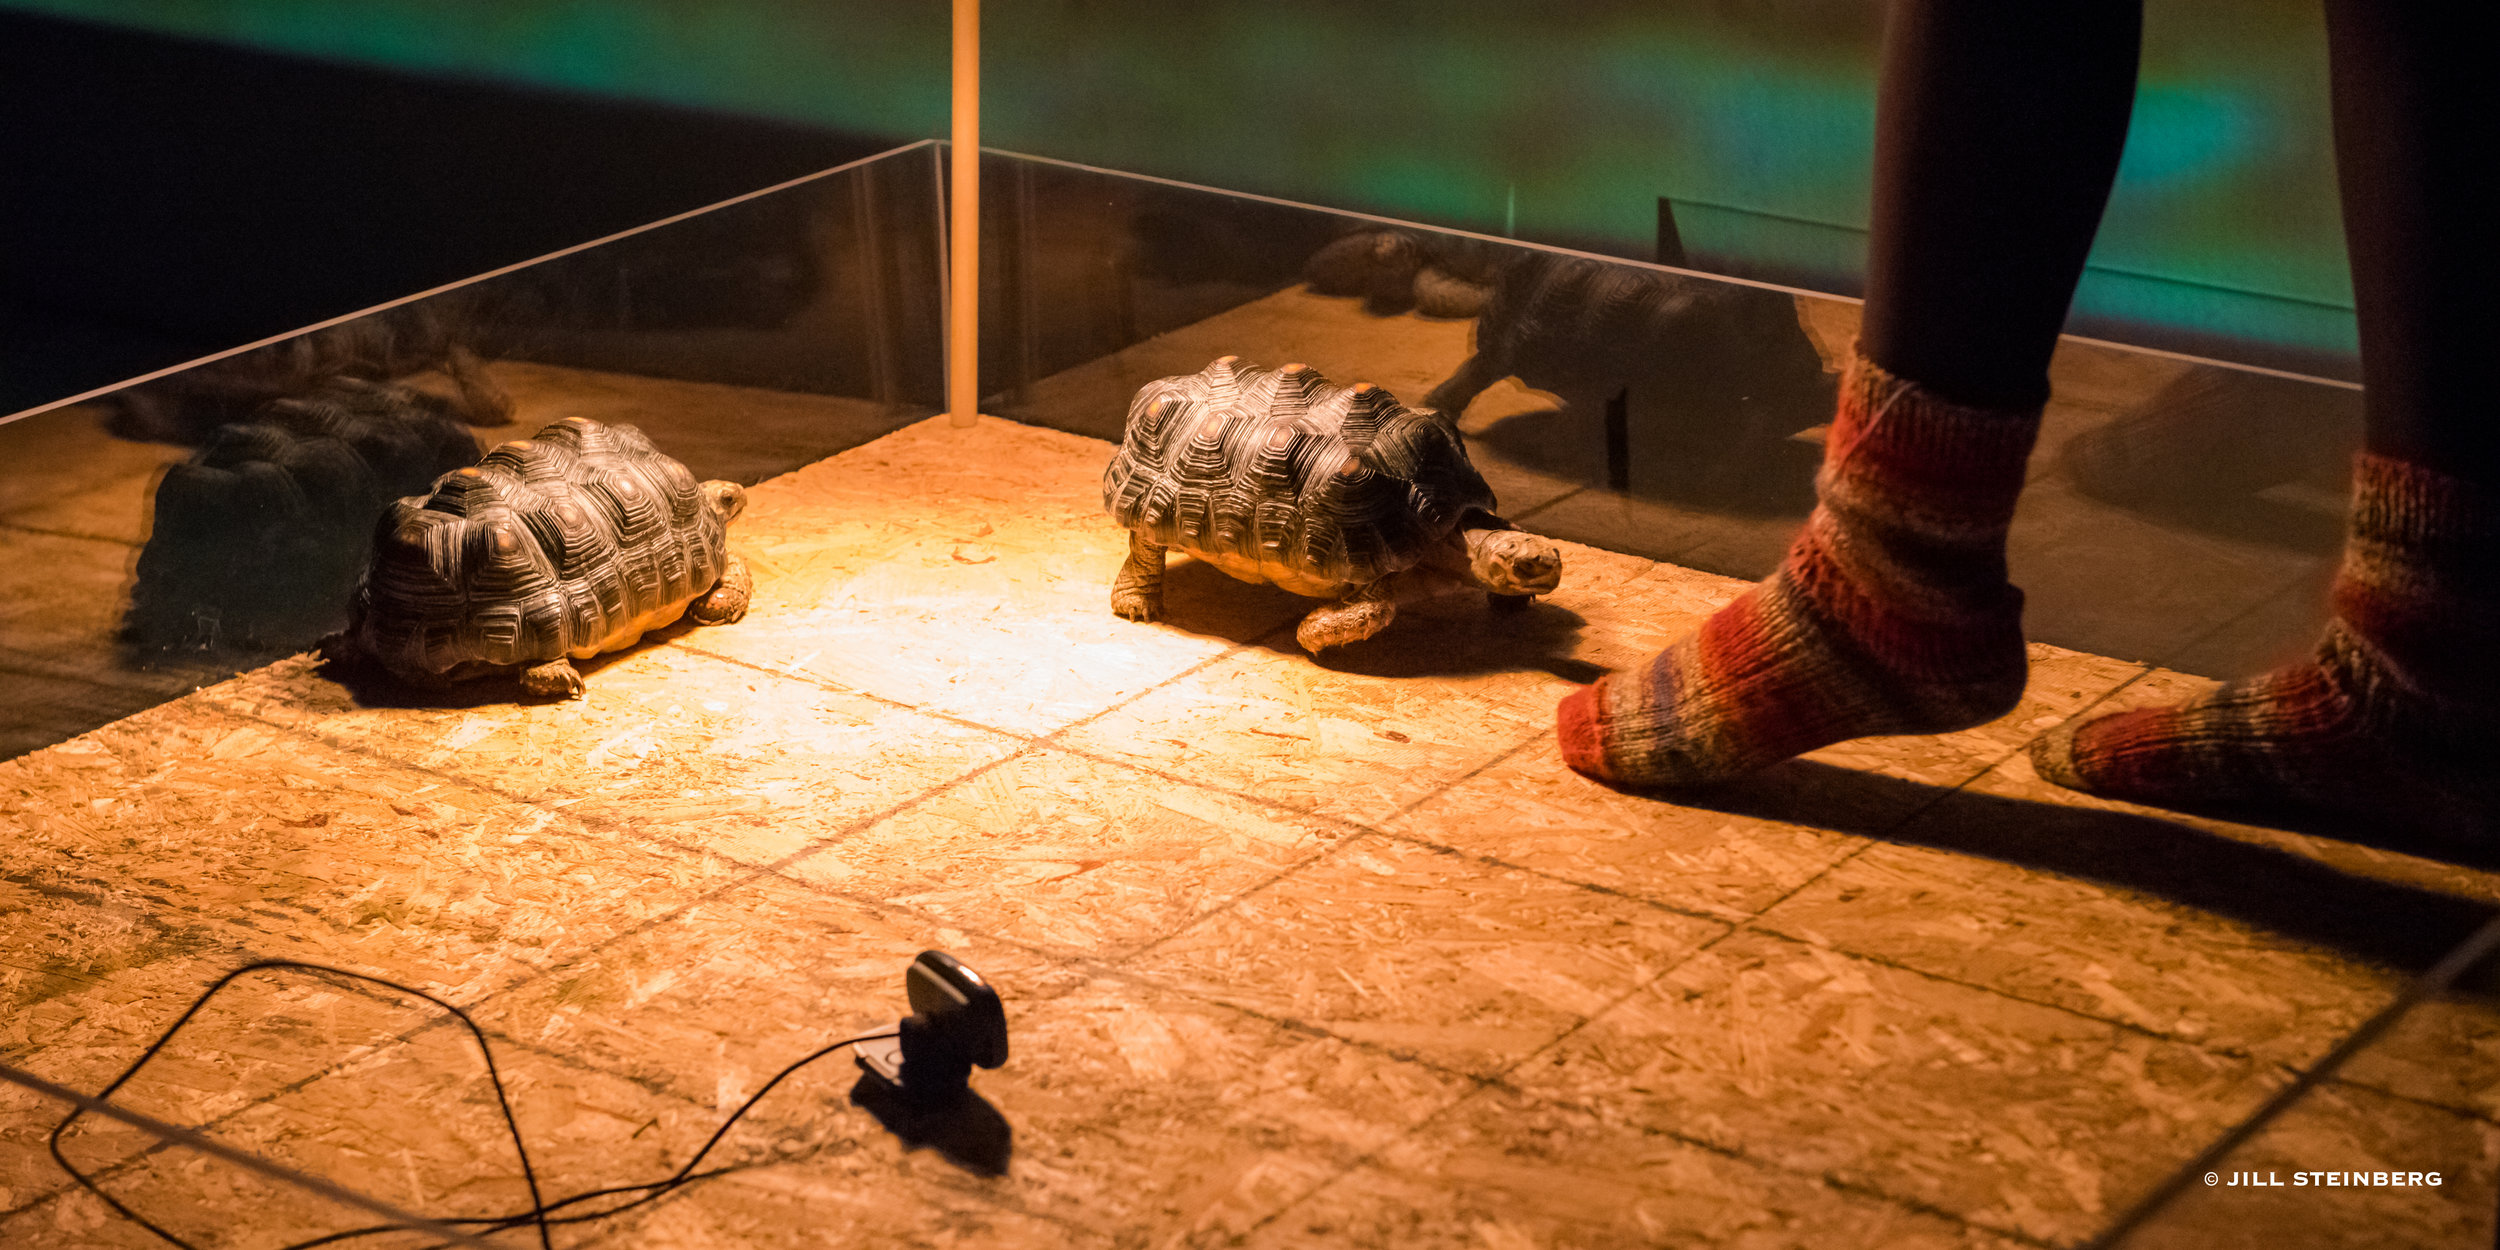 Photographs from June 2017 performance: tortoise stage, socks belonging to Ayse Deniz Karacagil